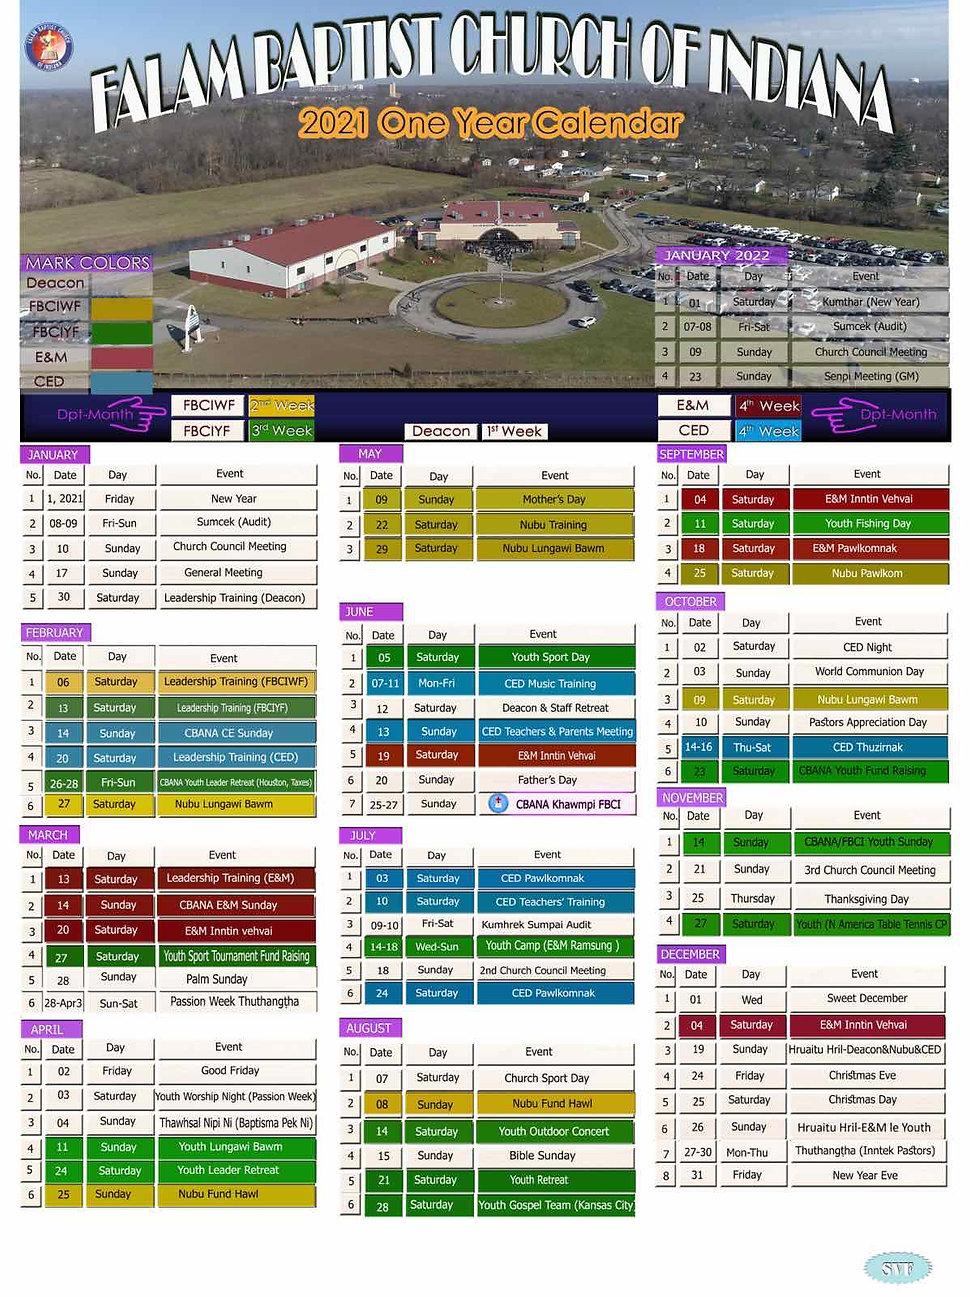 FBCI Calendar 2021.jpg